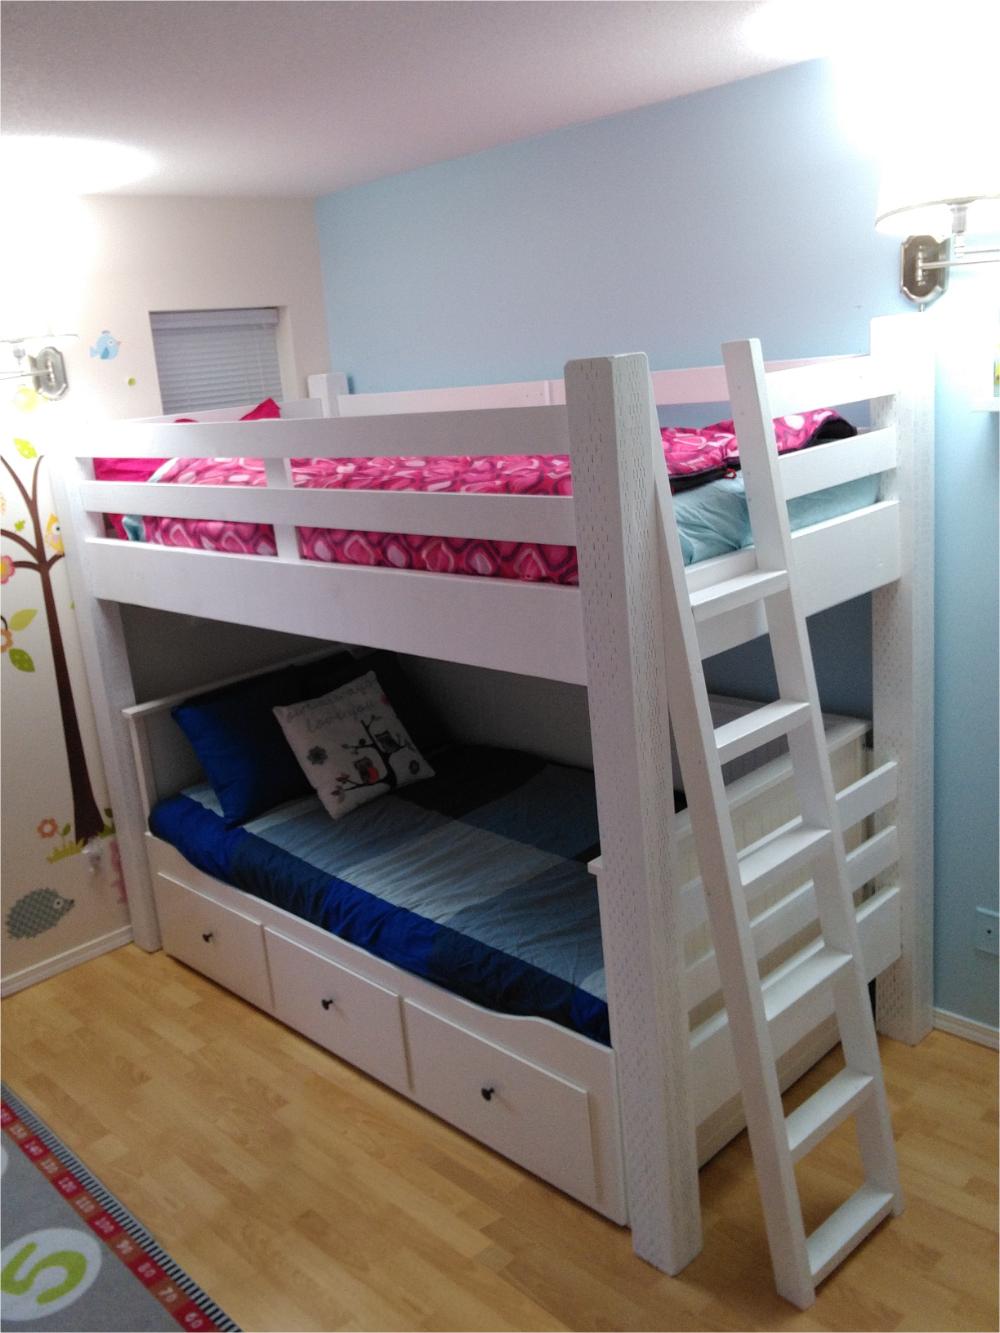 Ikea Stuva Loft Bed Hack Custom Loft Bed Built To Wrap The Ikea Hemnes Daybed Kids Room Stuva Loft Bed Bunk Bed With Slide Diy Loft Bed